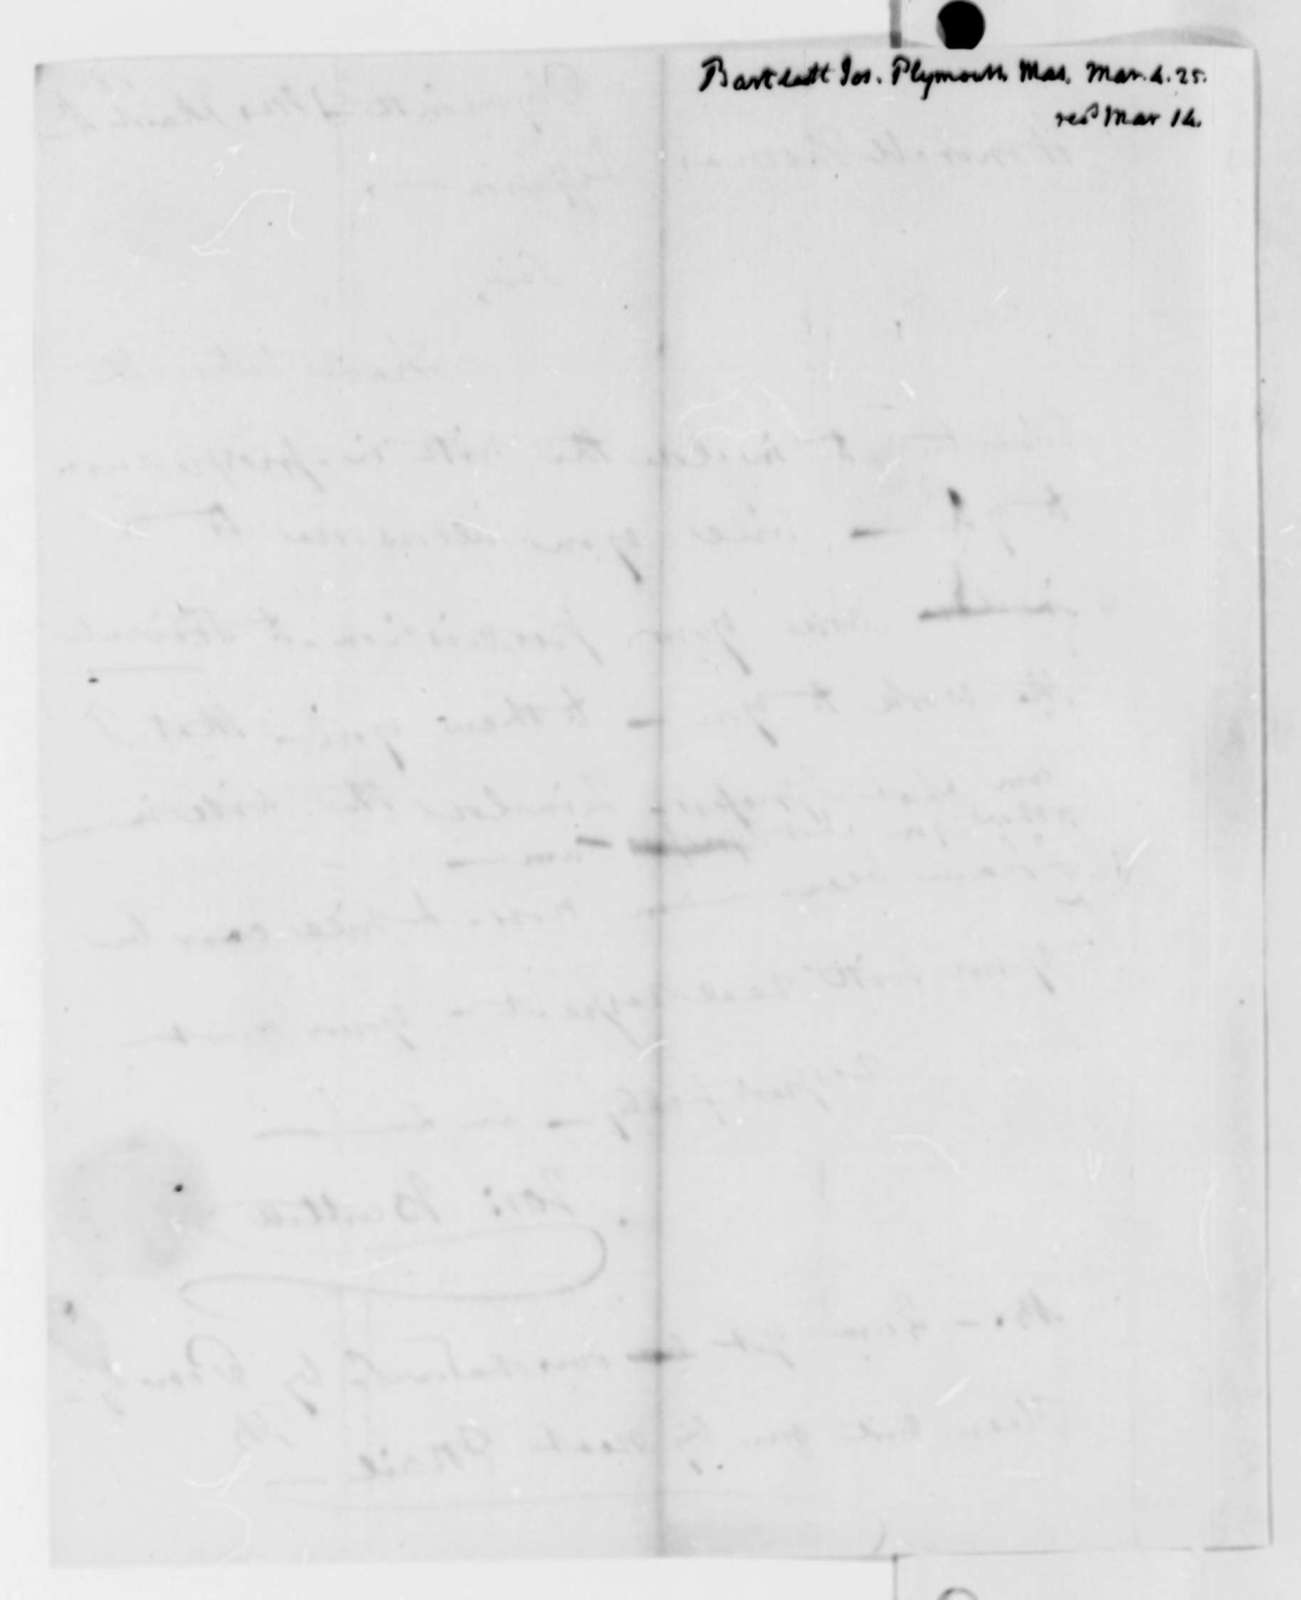 Joseph Bartlett to Thomas Jefferson, March 4, 1825